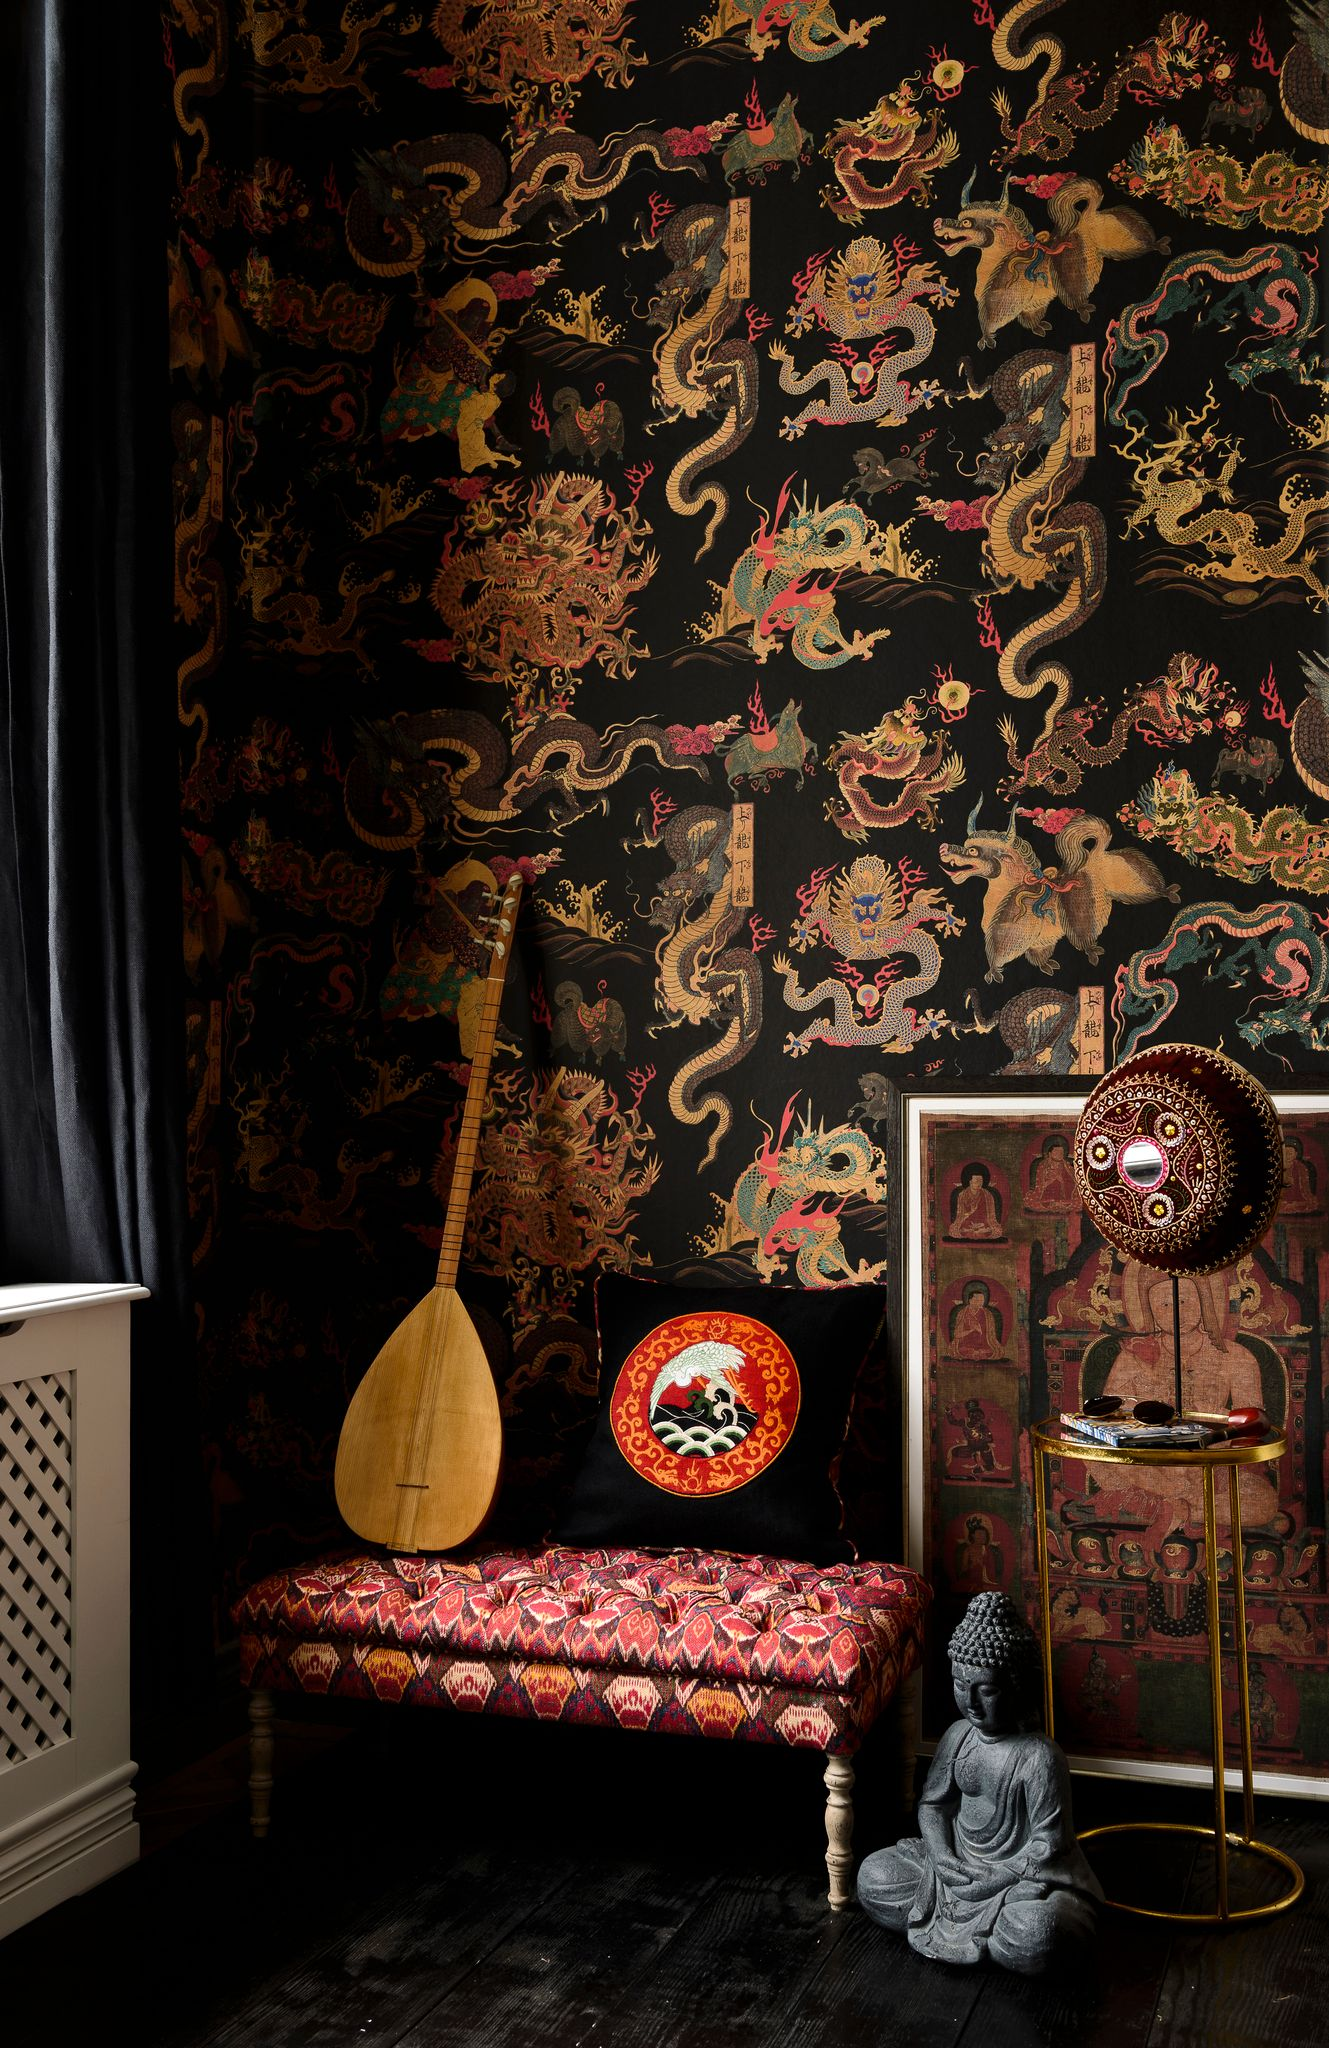 DRAGONS OF TIBET Wallpaper